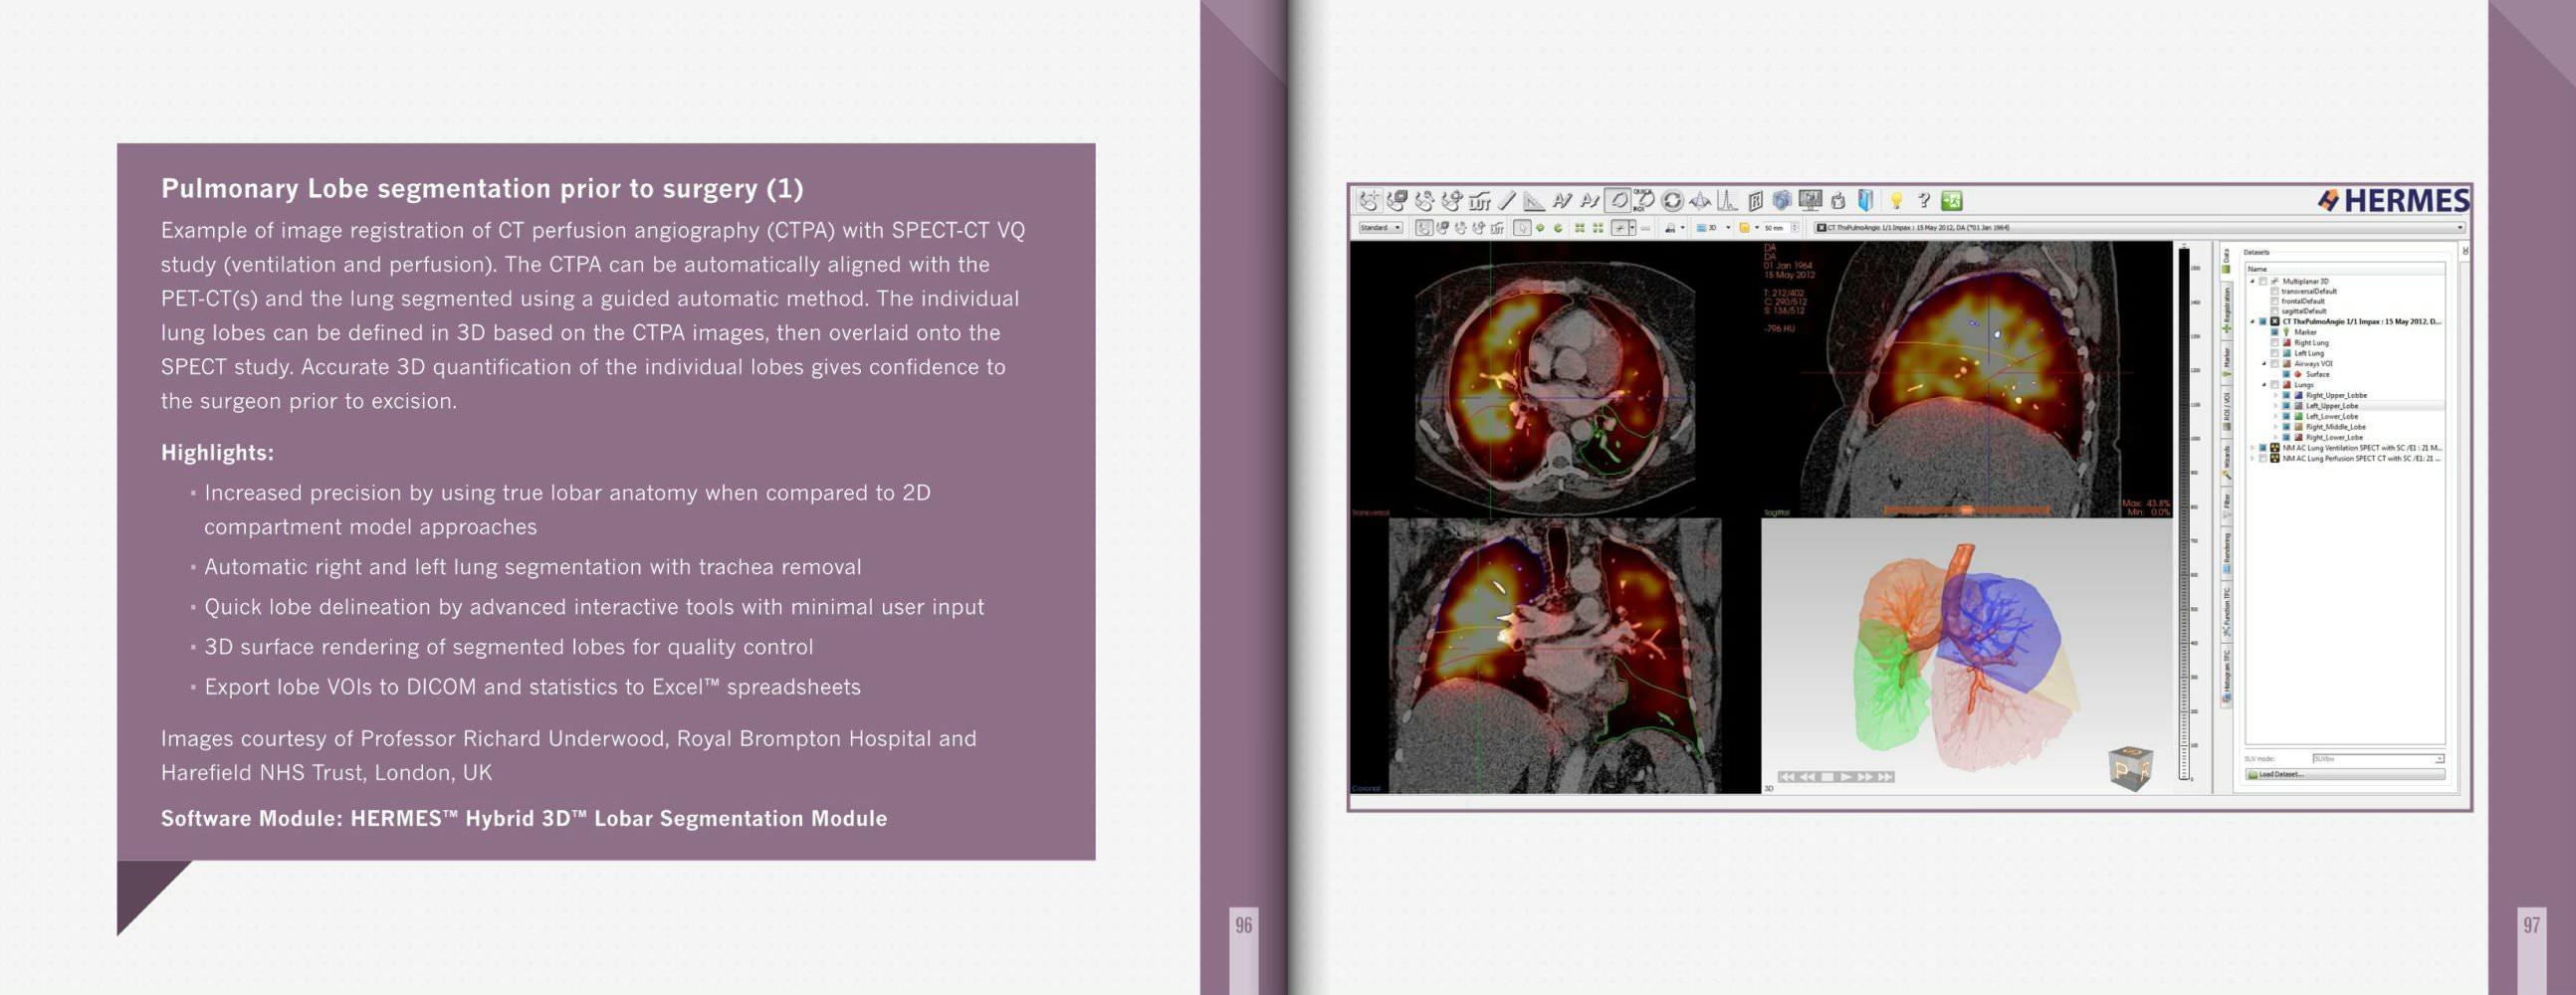 Pulmonary Lobe segmentation prior to surgery - Hermes Medical ...